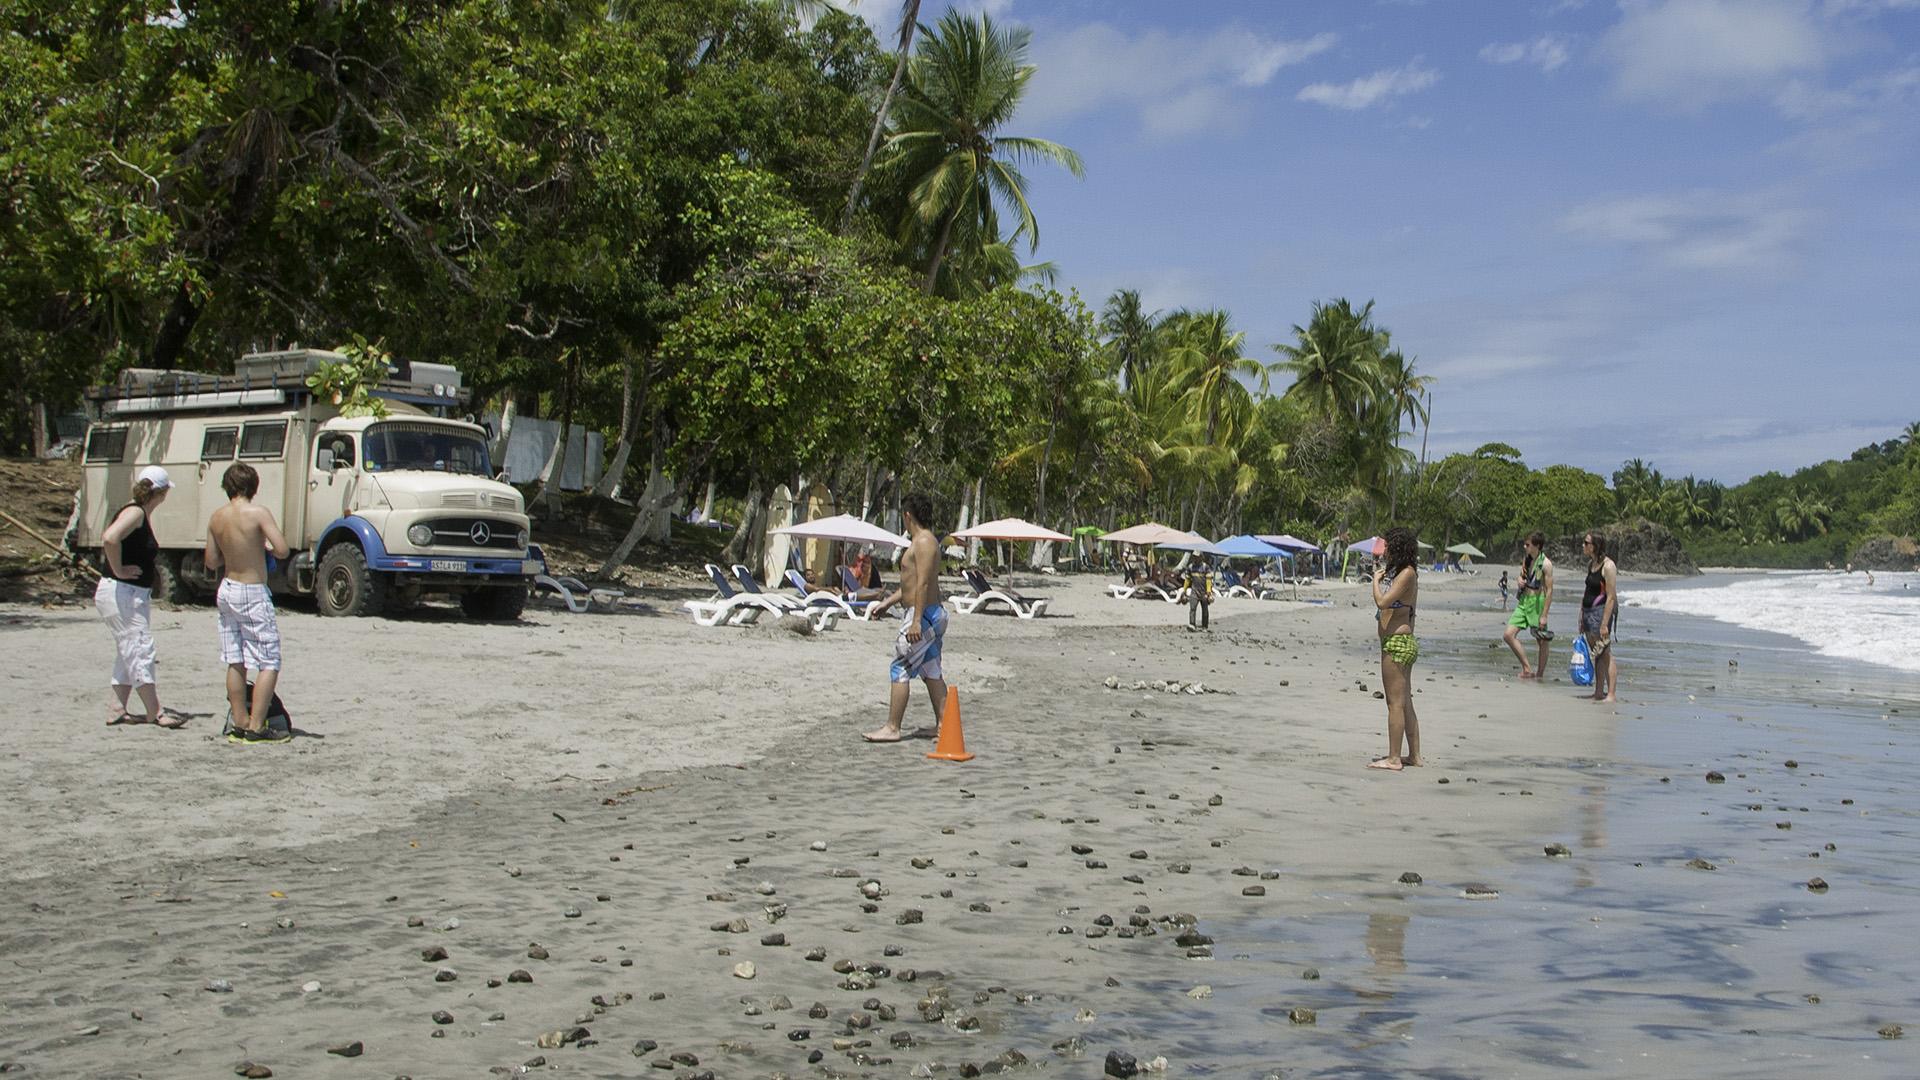 Festgefahren am Strand in Costa Rica